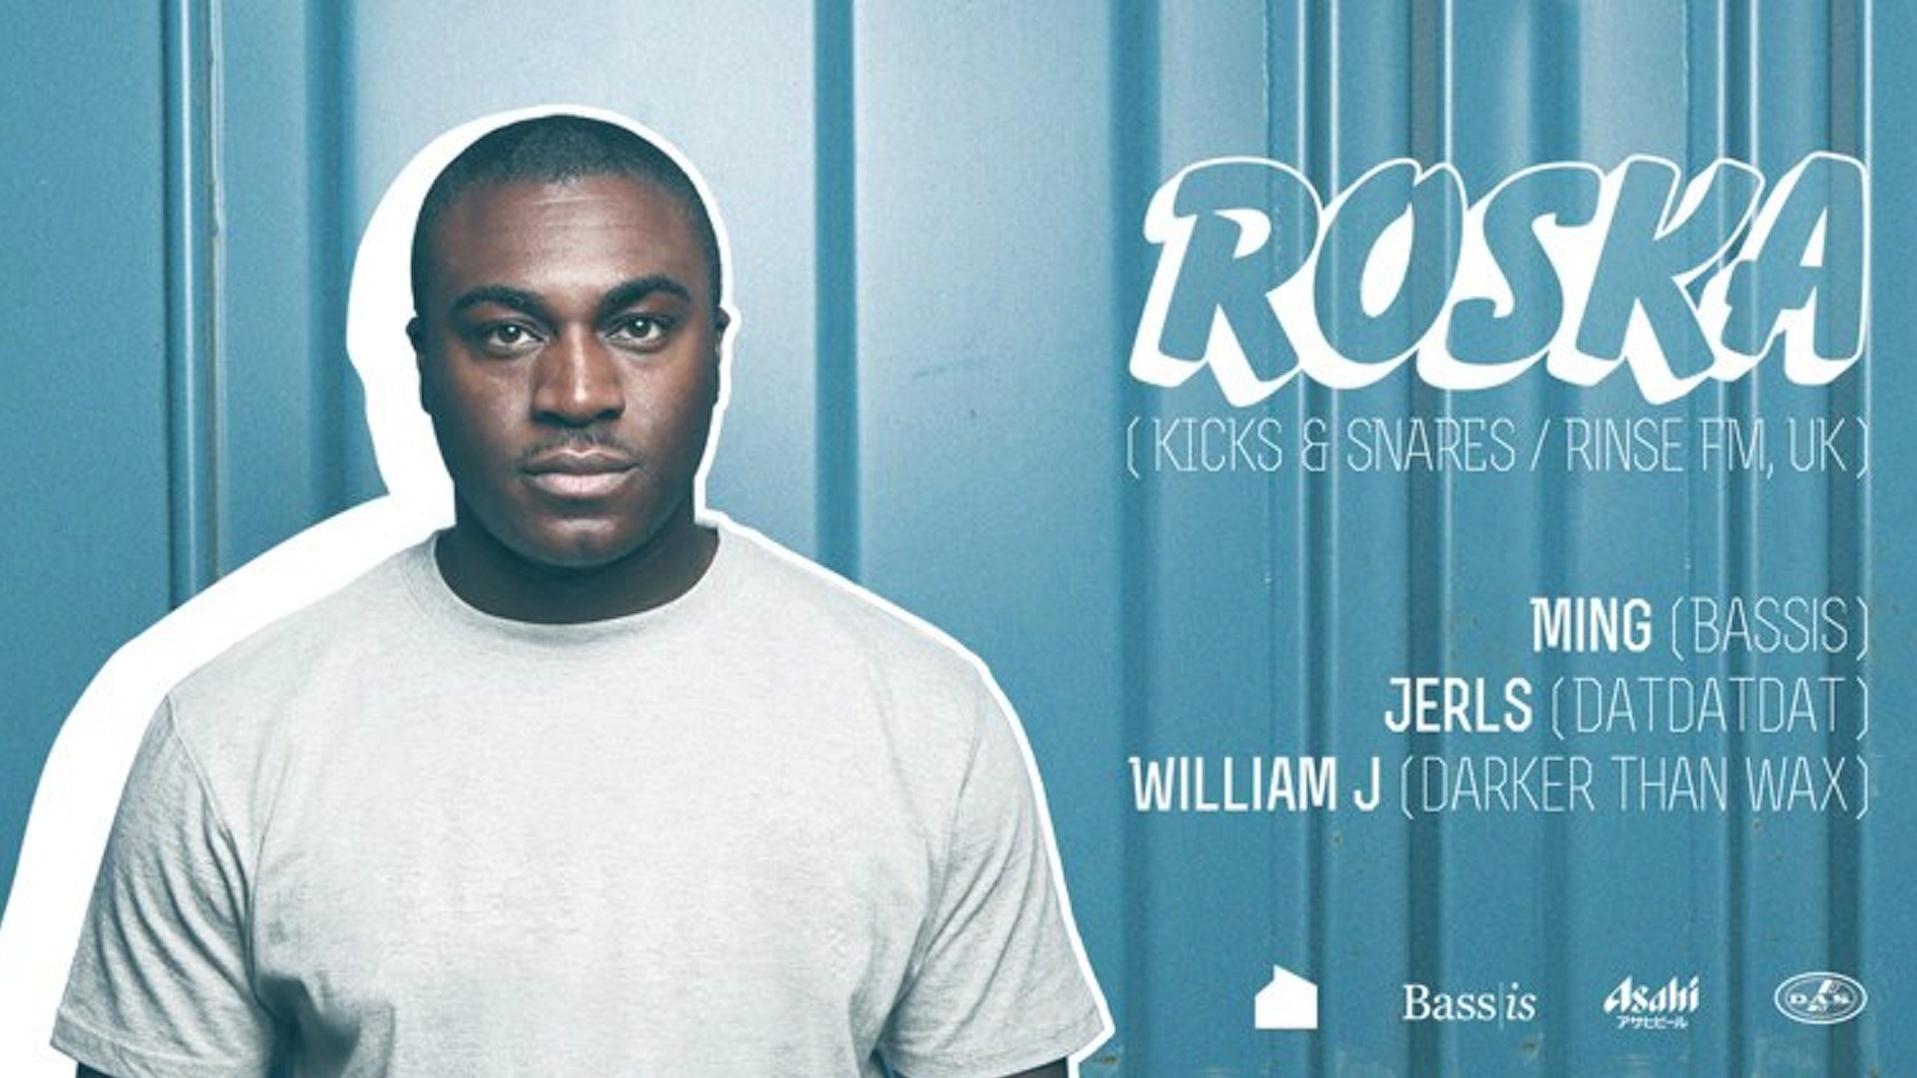 Bassis: Roska